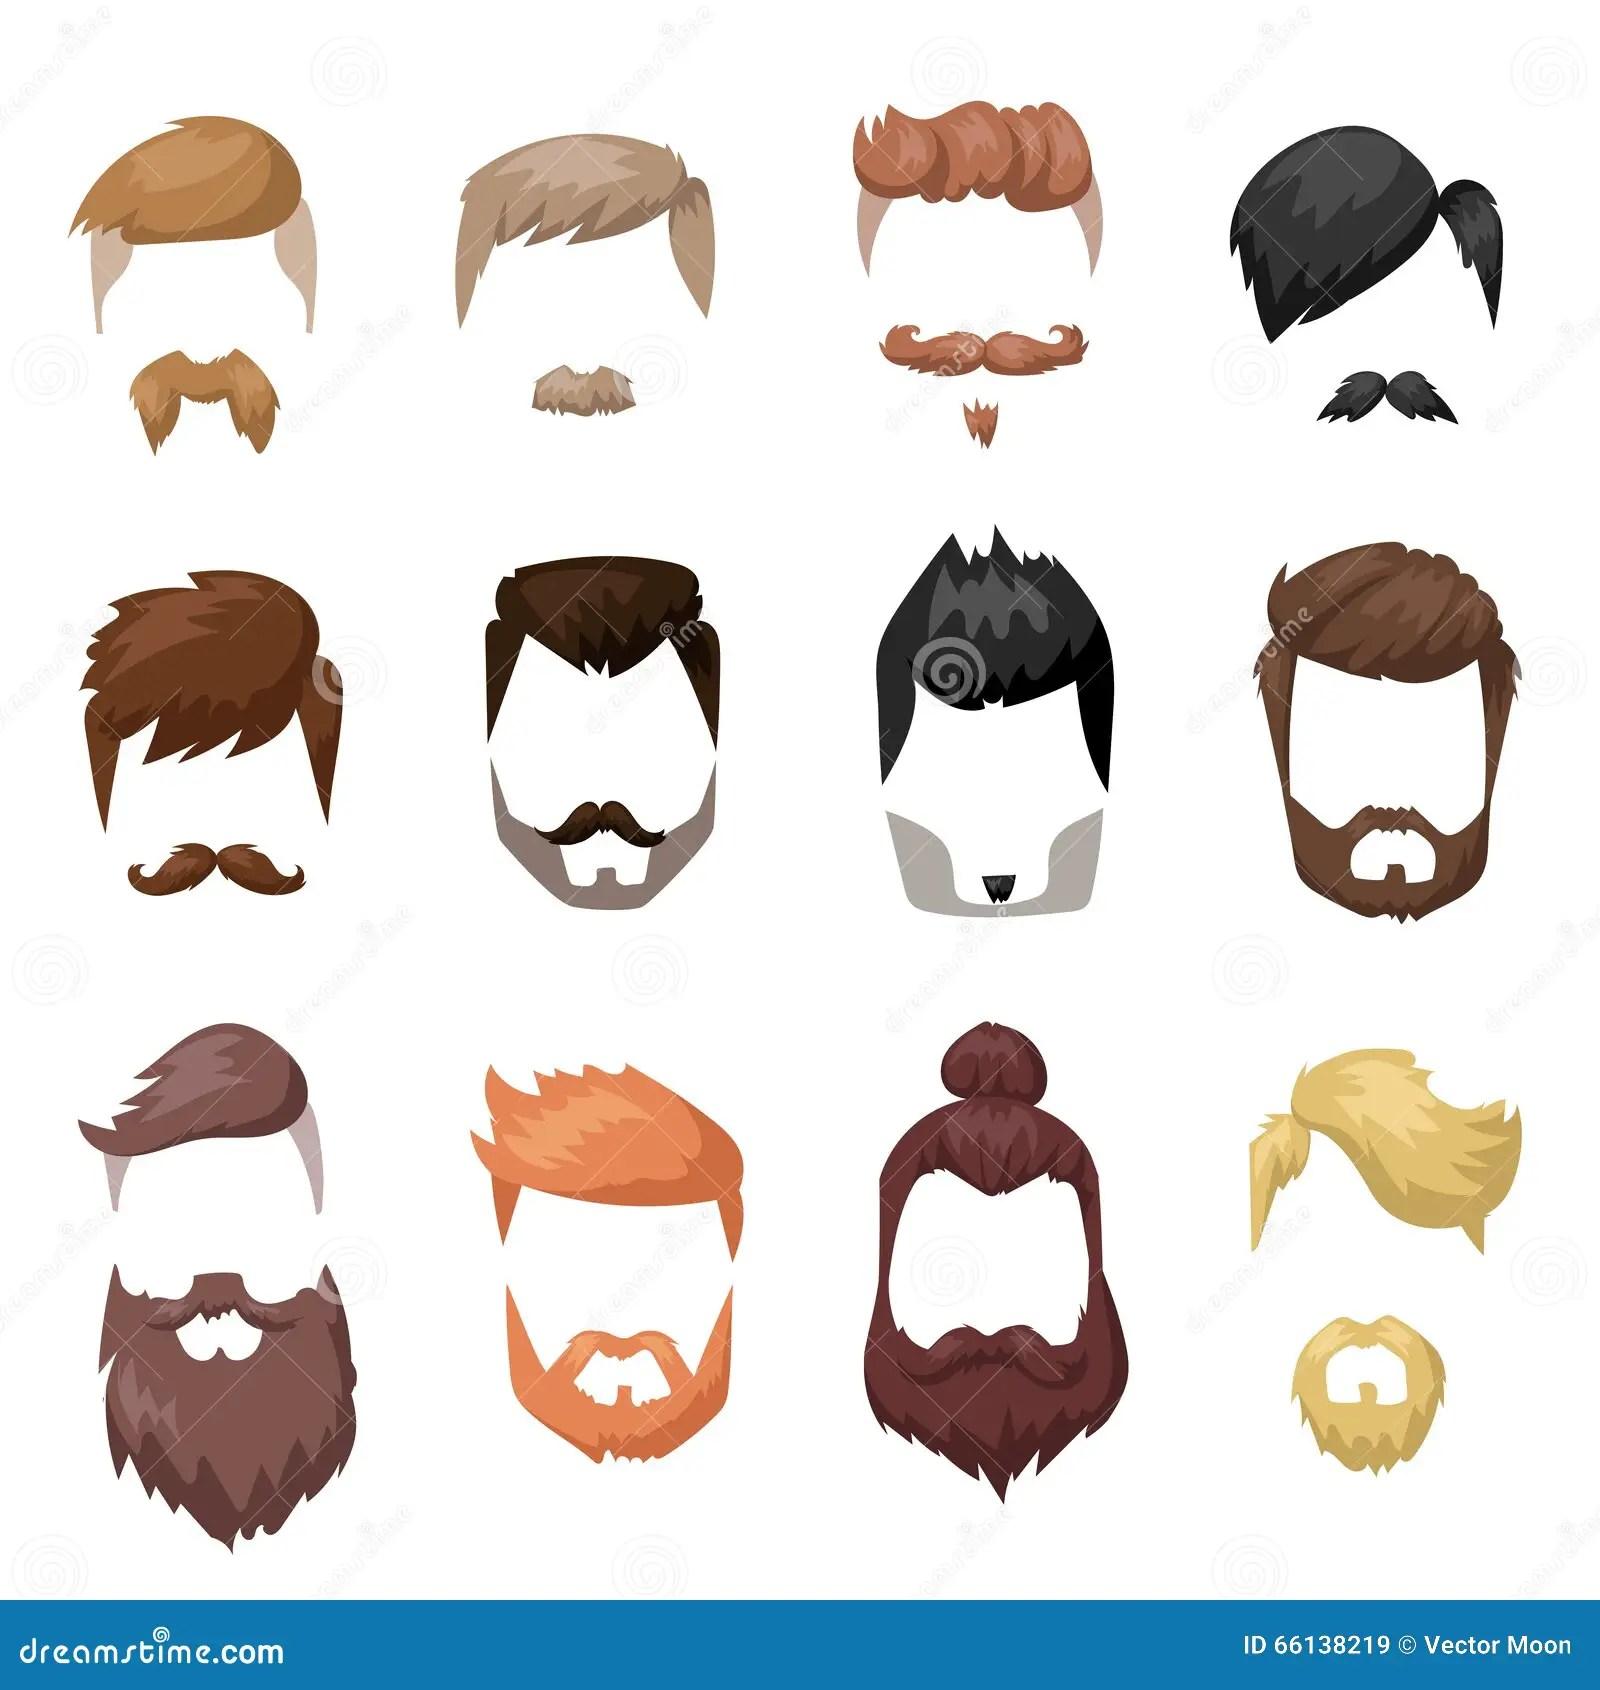 Hairstyles Beard And Hair Face Cut Mask Flat Cartoon